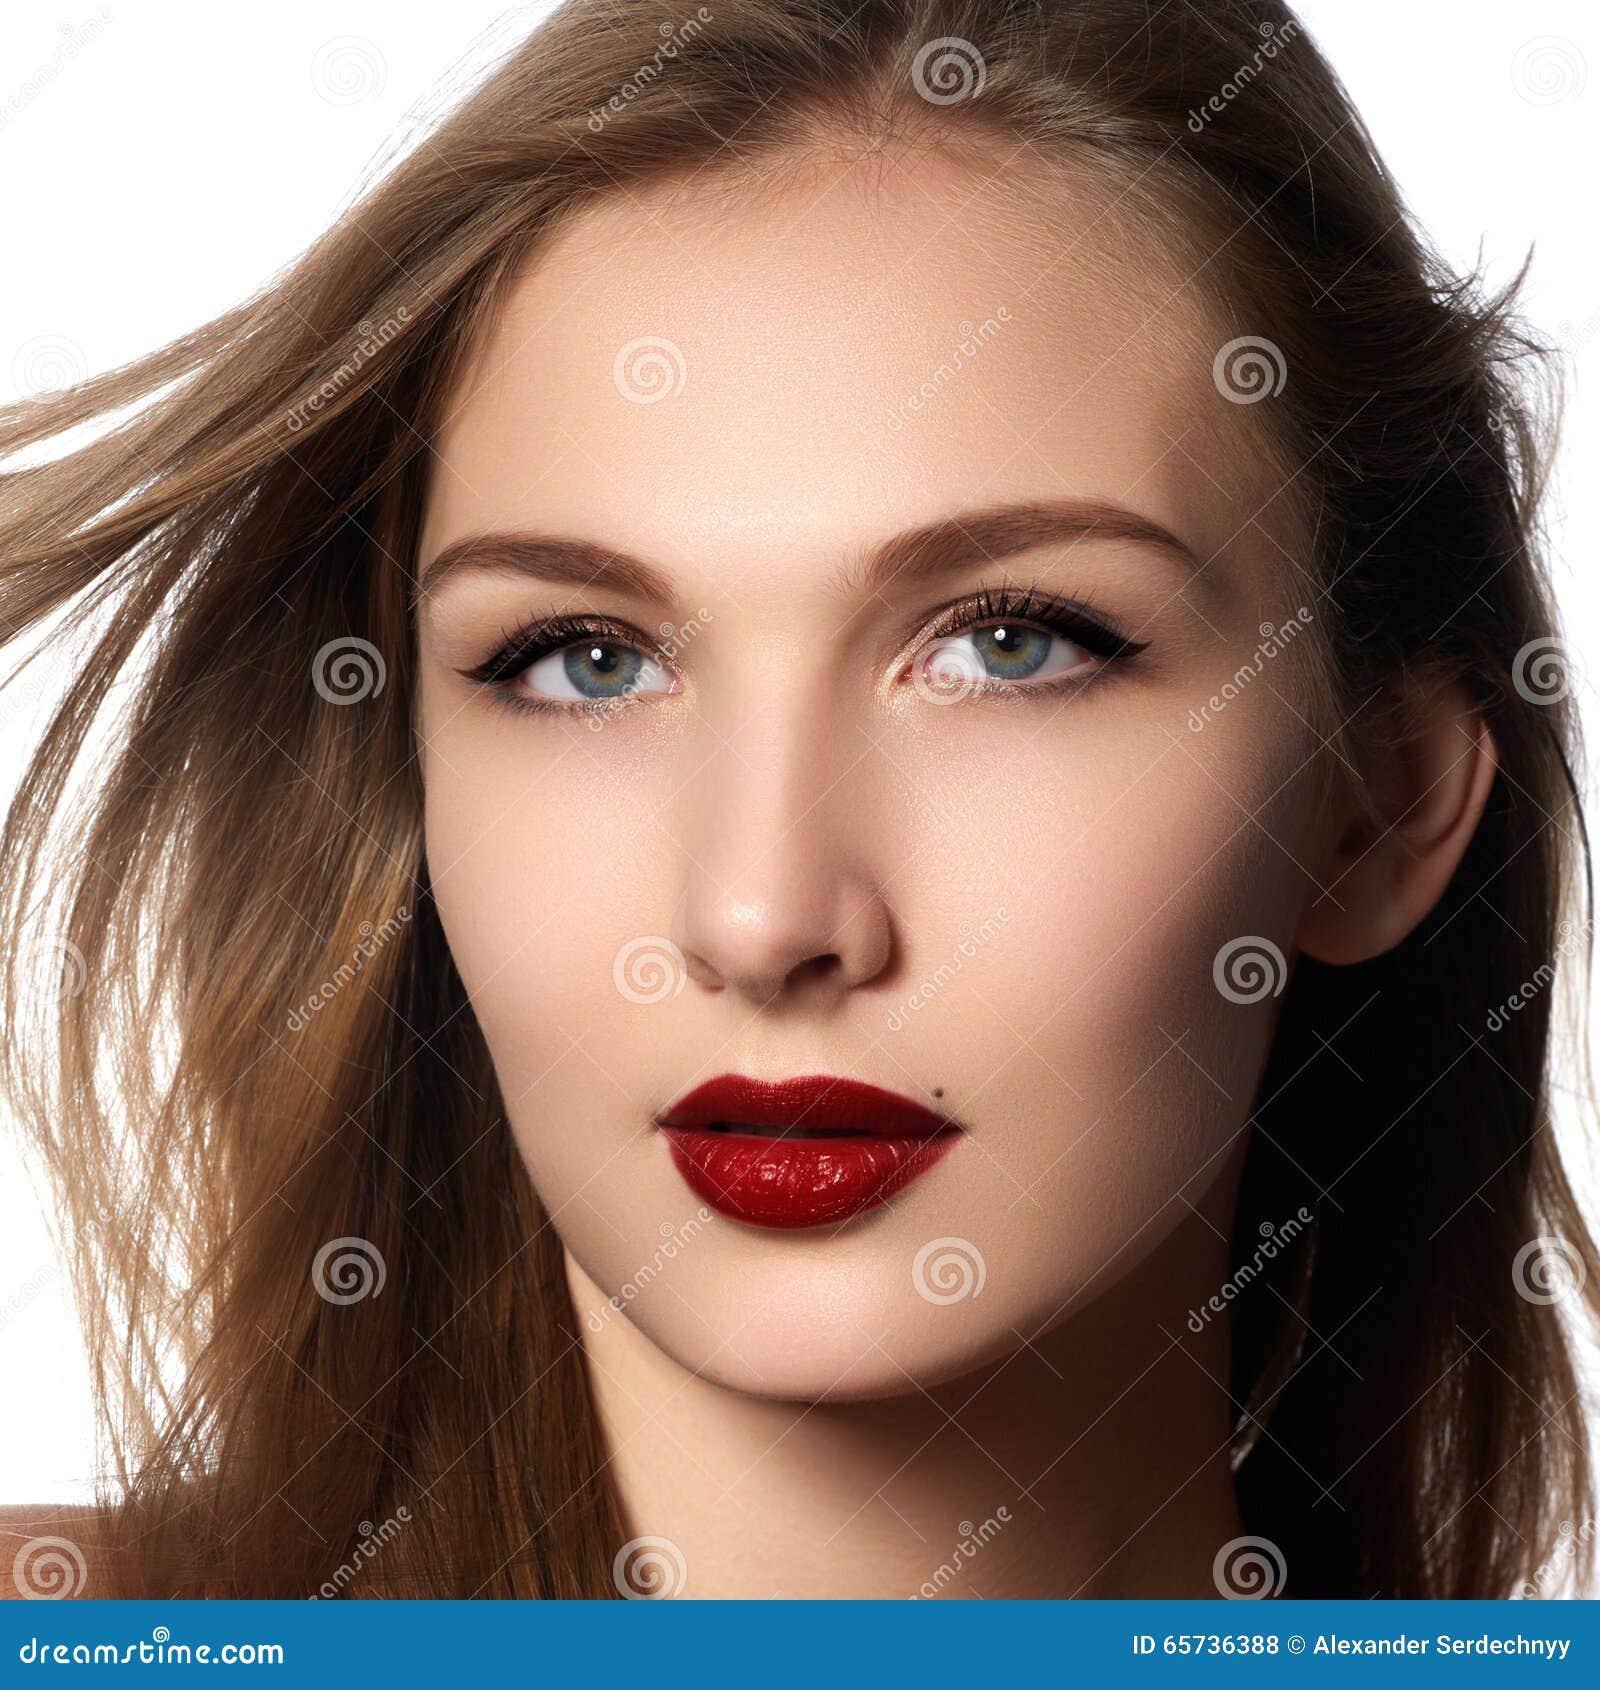 Health, Beauty, Wellness, Haircare, Cosmetics And Make-up